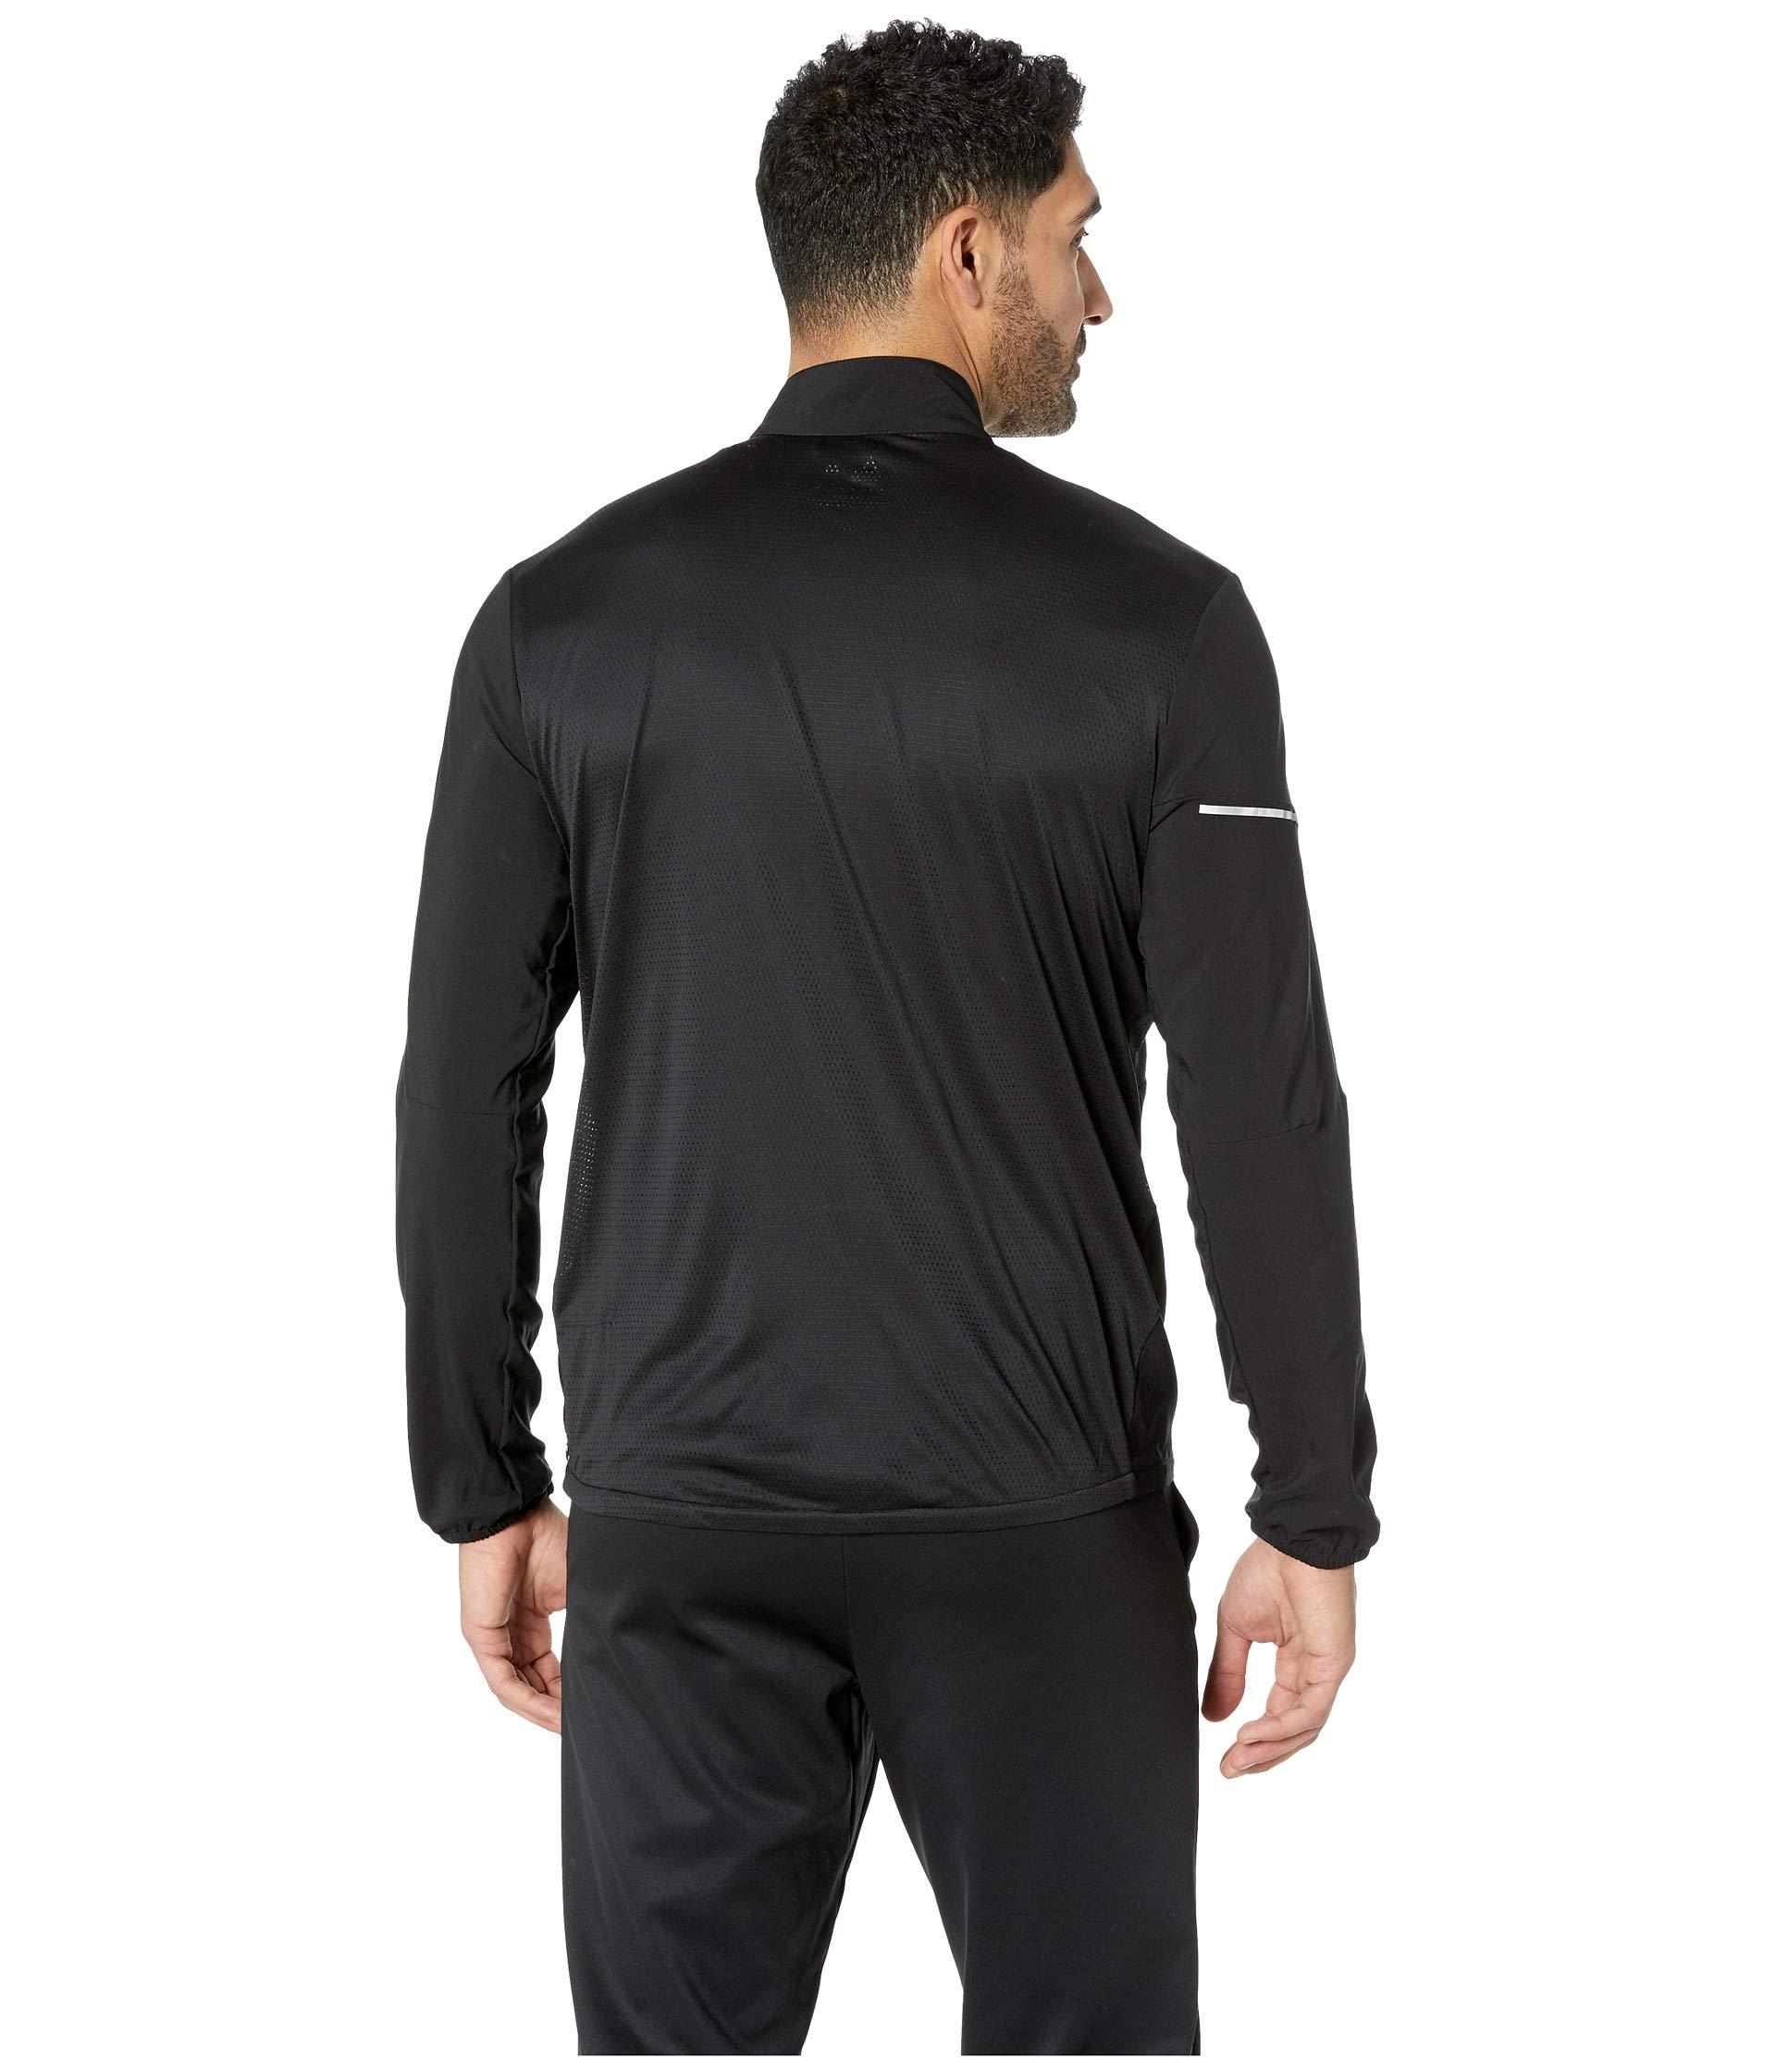 Woven 1 Jacket Reebok Black Running 1wpqp4H